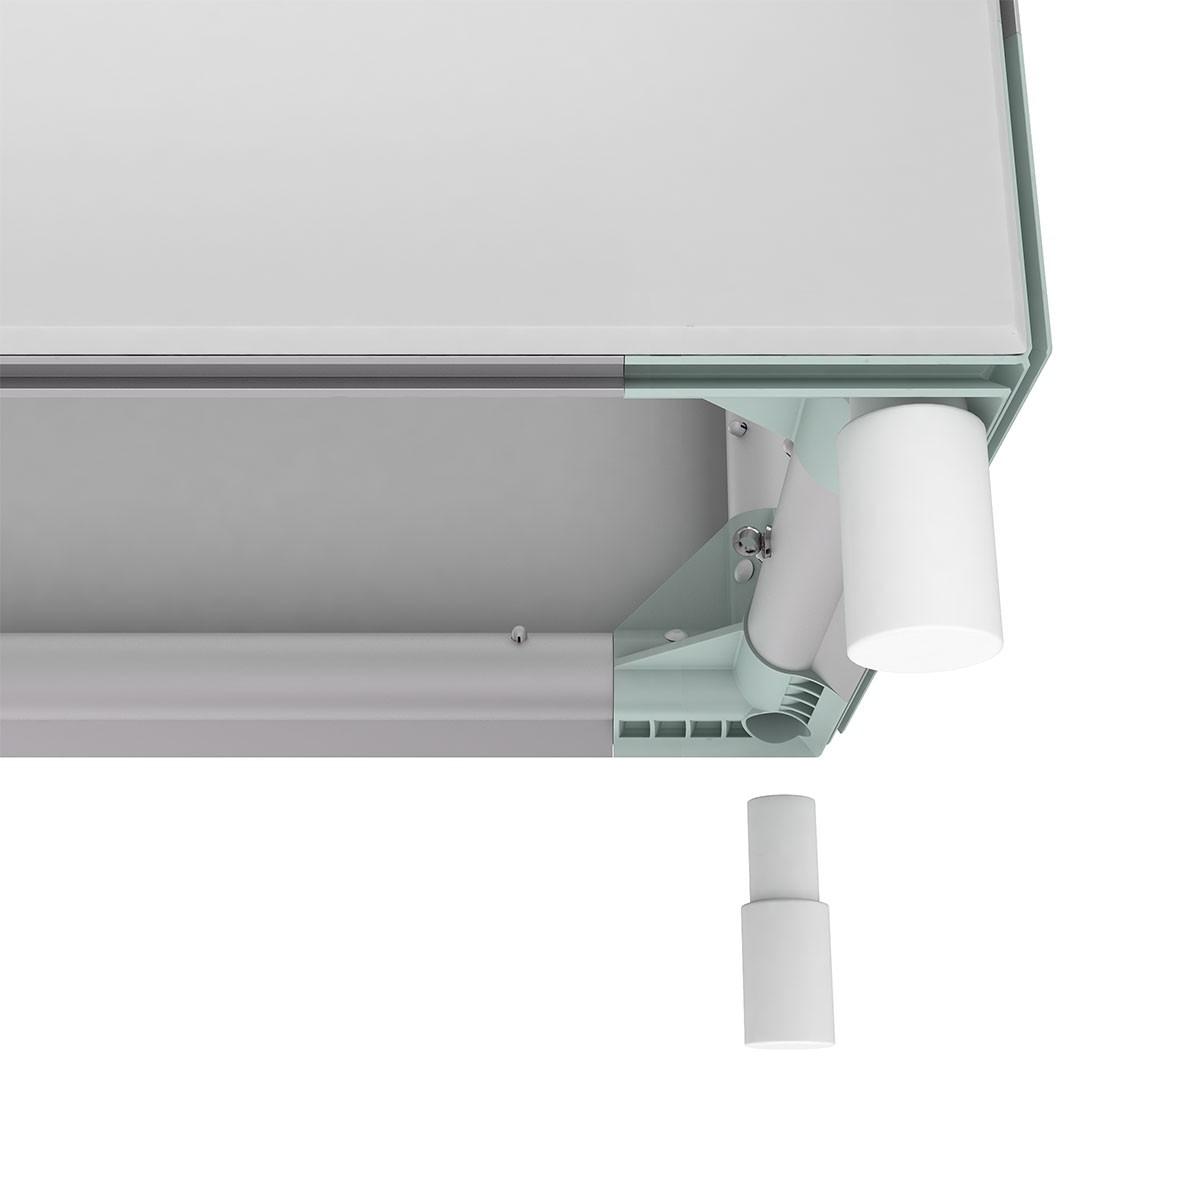 Casonara 100L Backlit Counter